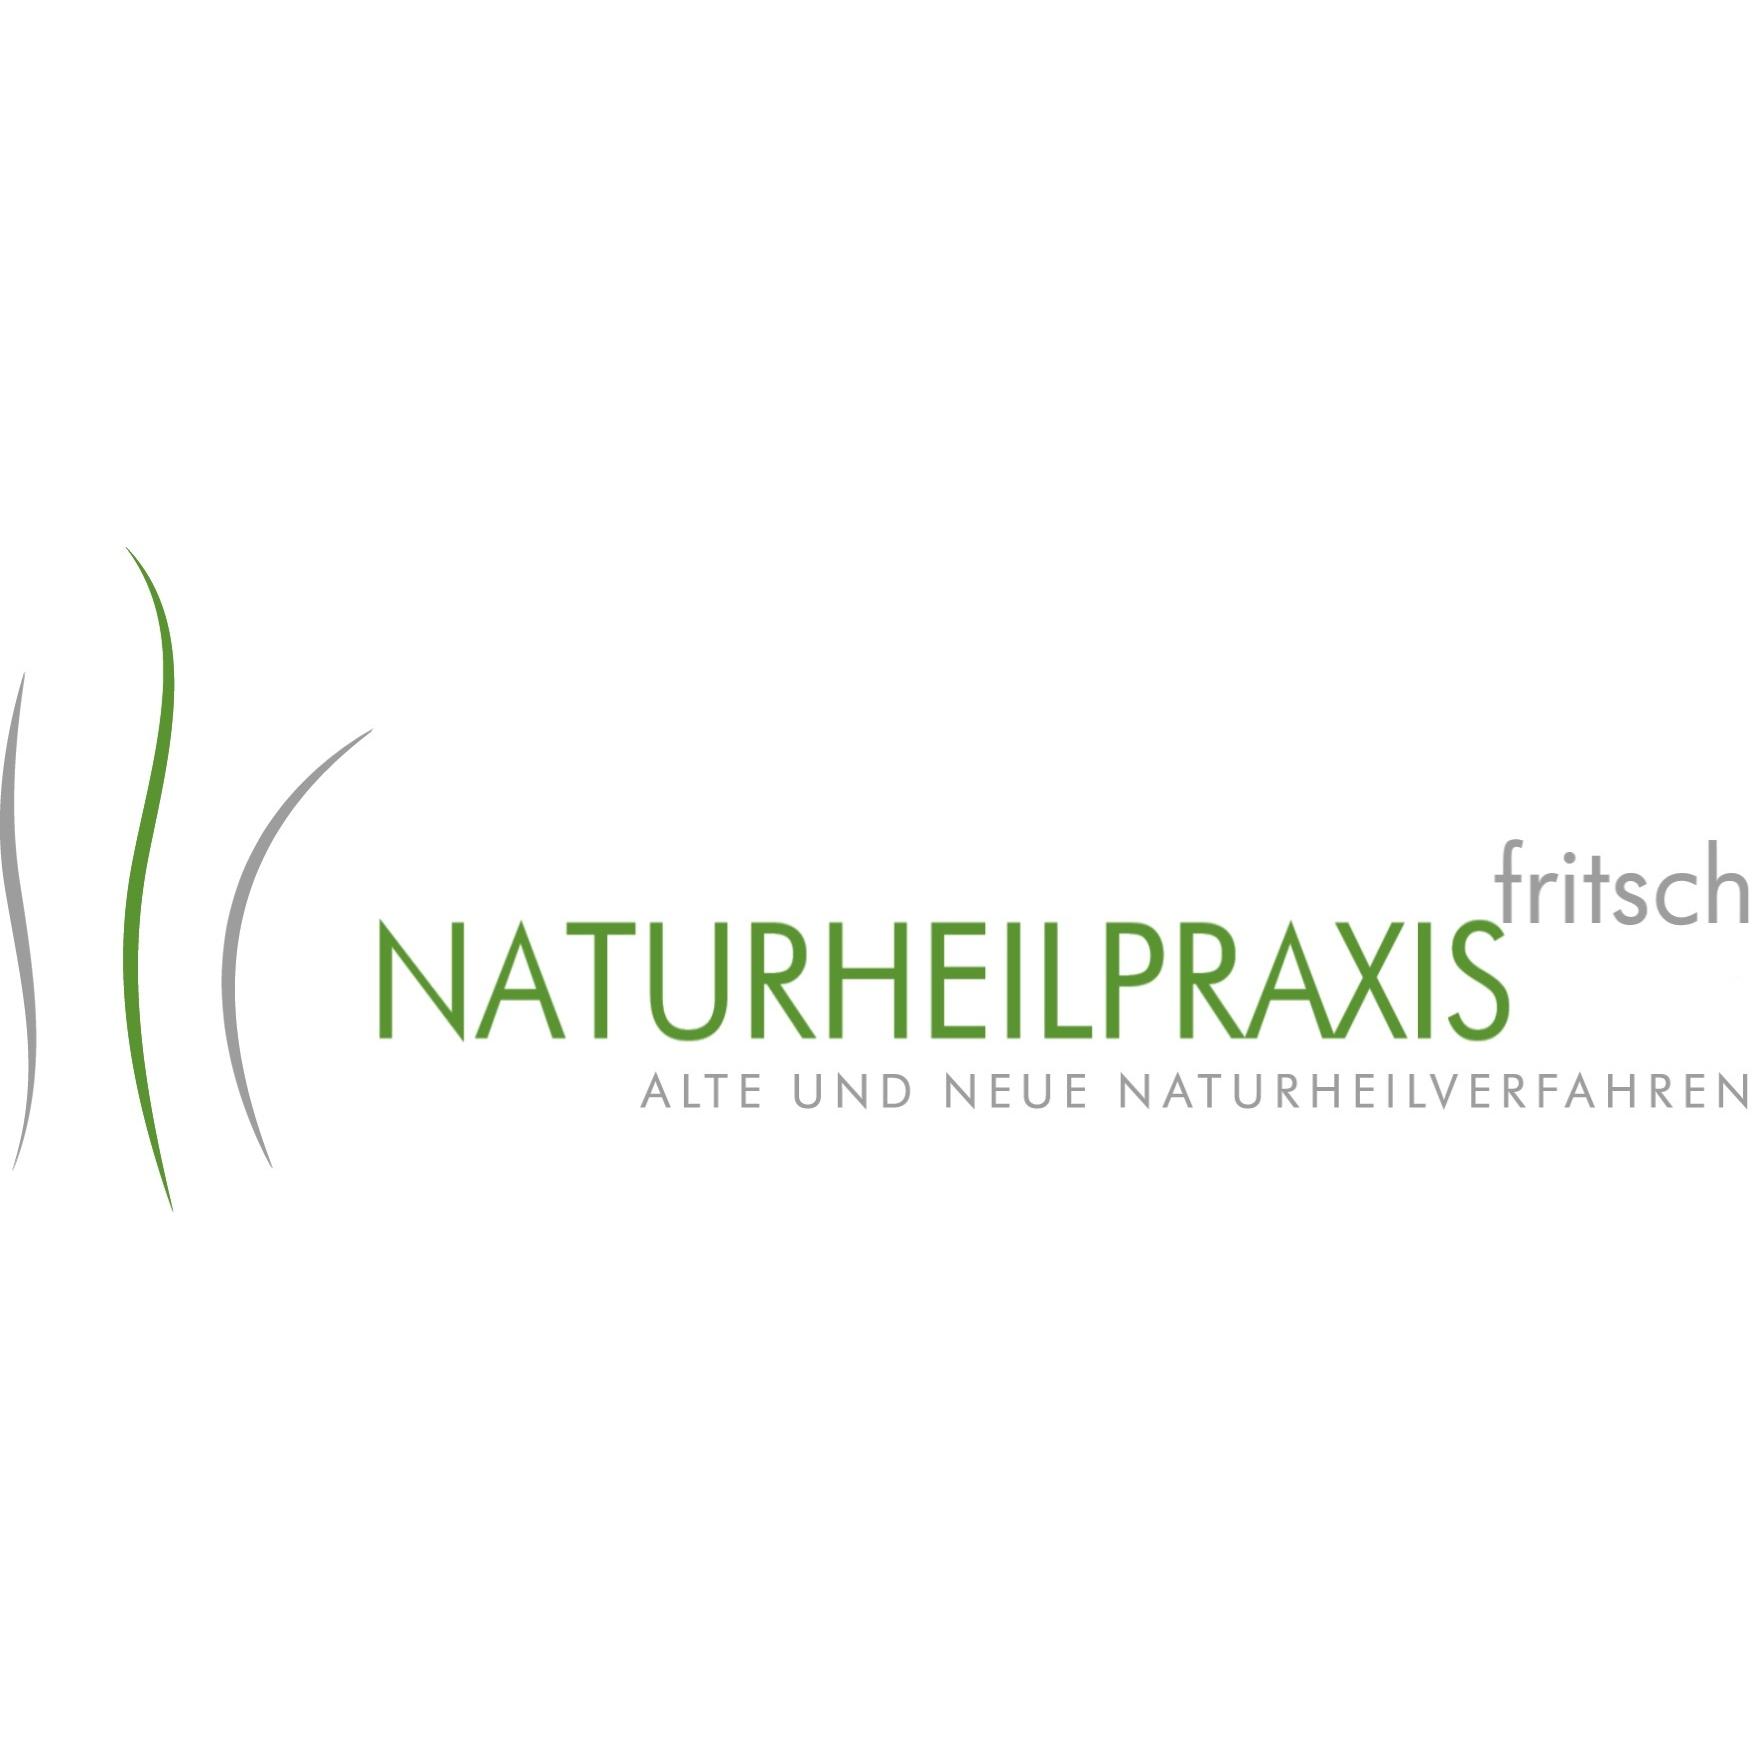 Bild zu Naturheilpraxis Dominik Fritsch in Frankfurt am Main